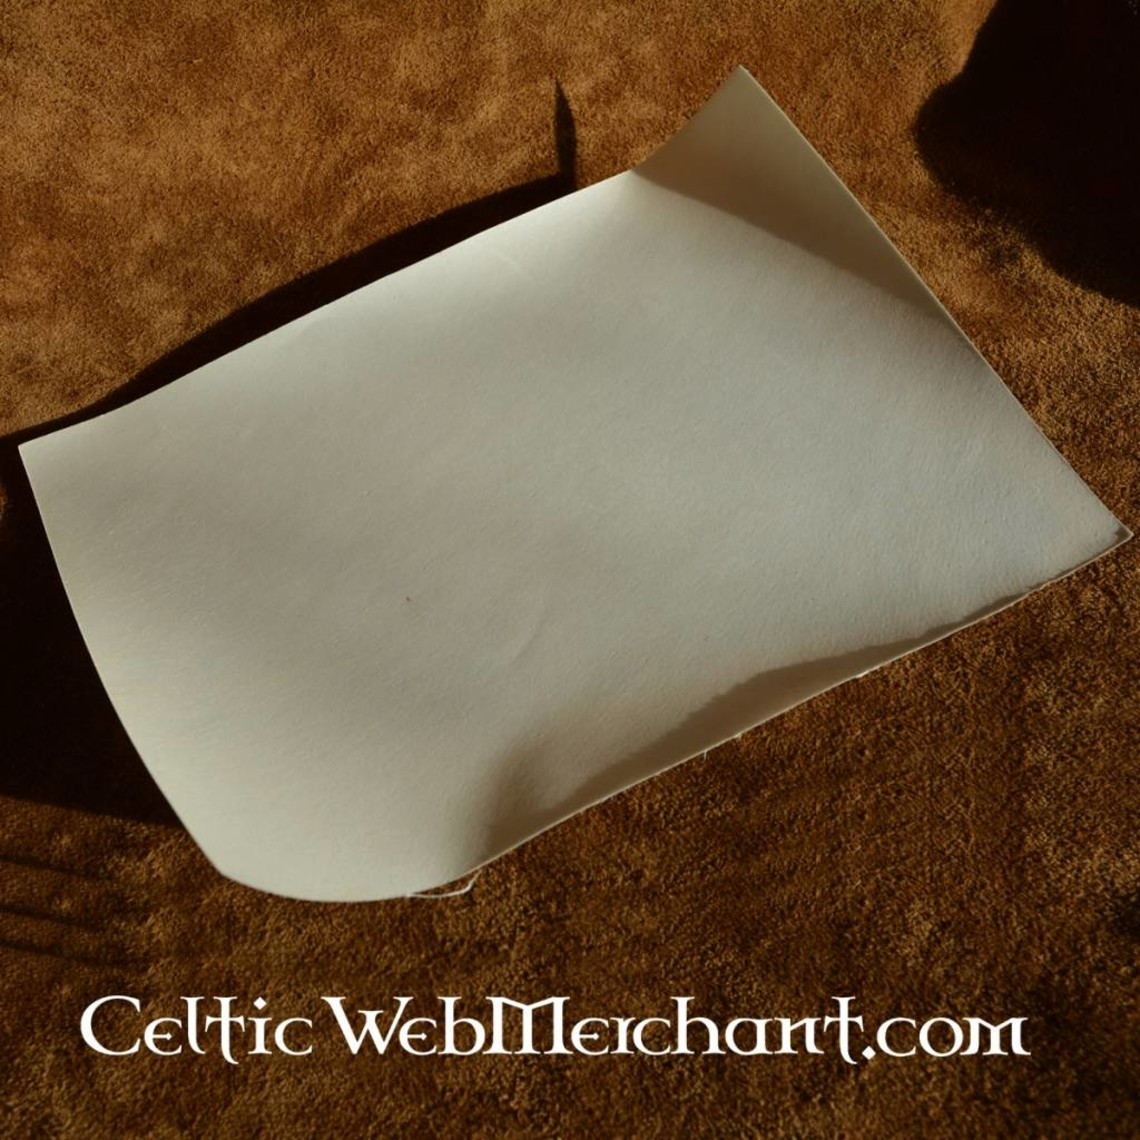 Pergaminu blachy 20x15 cm